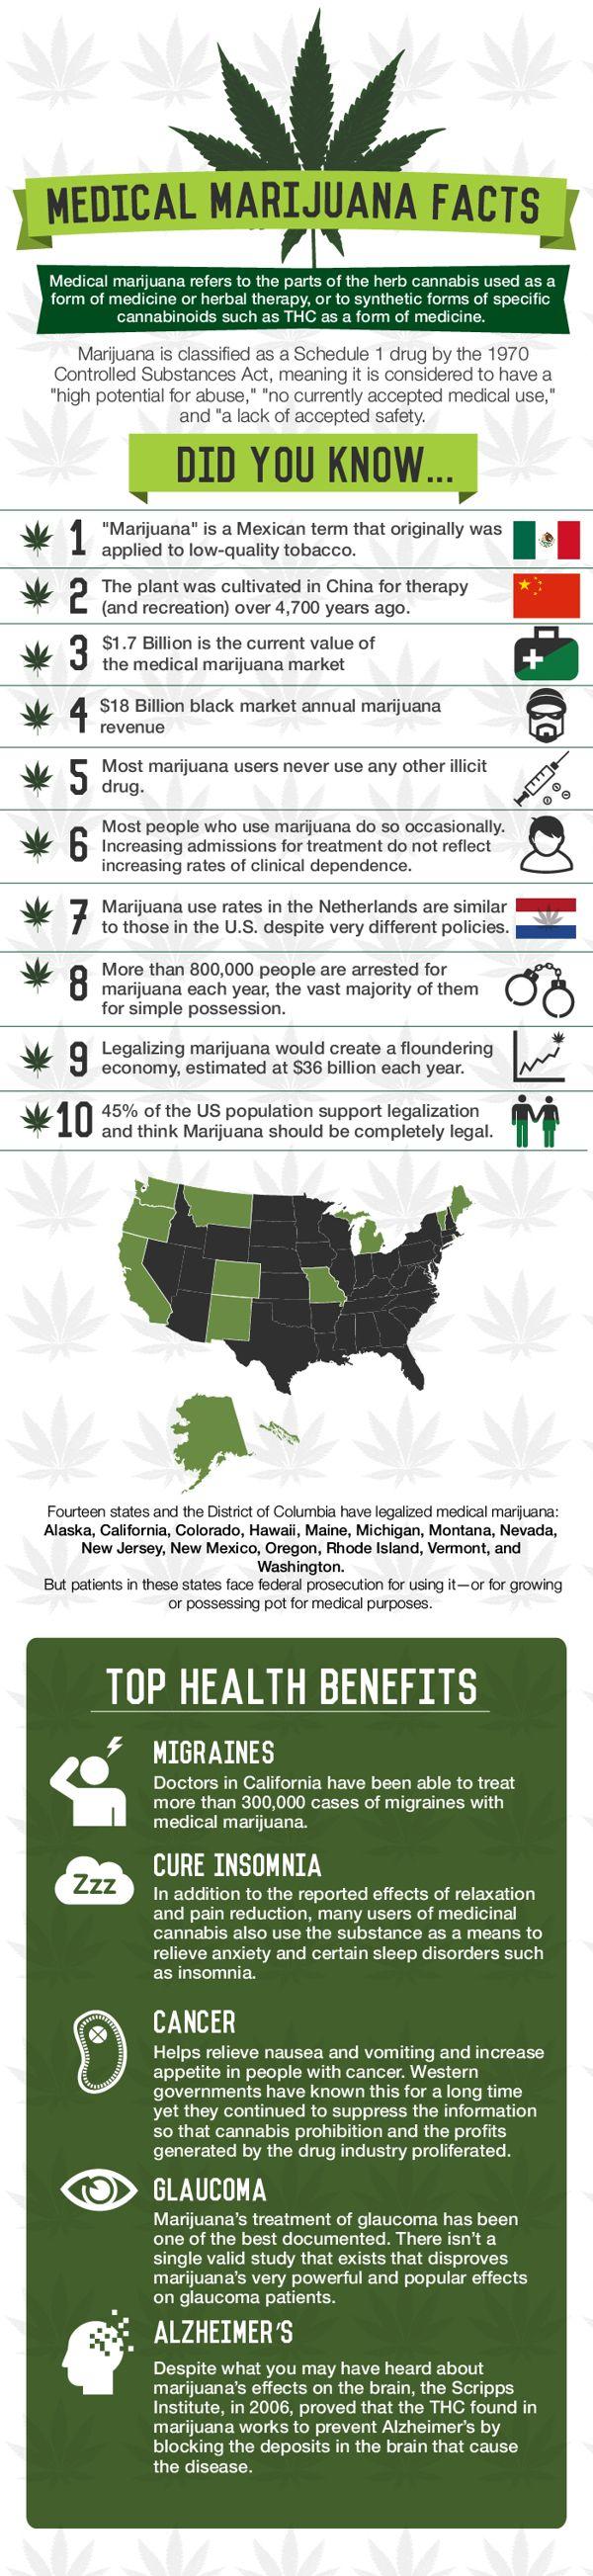 The facts on Medical Marijuana.